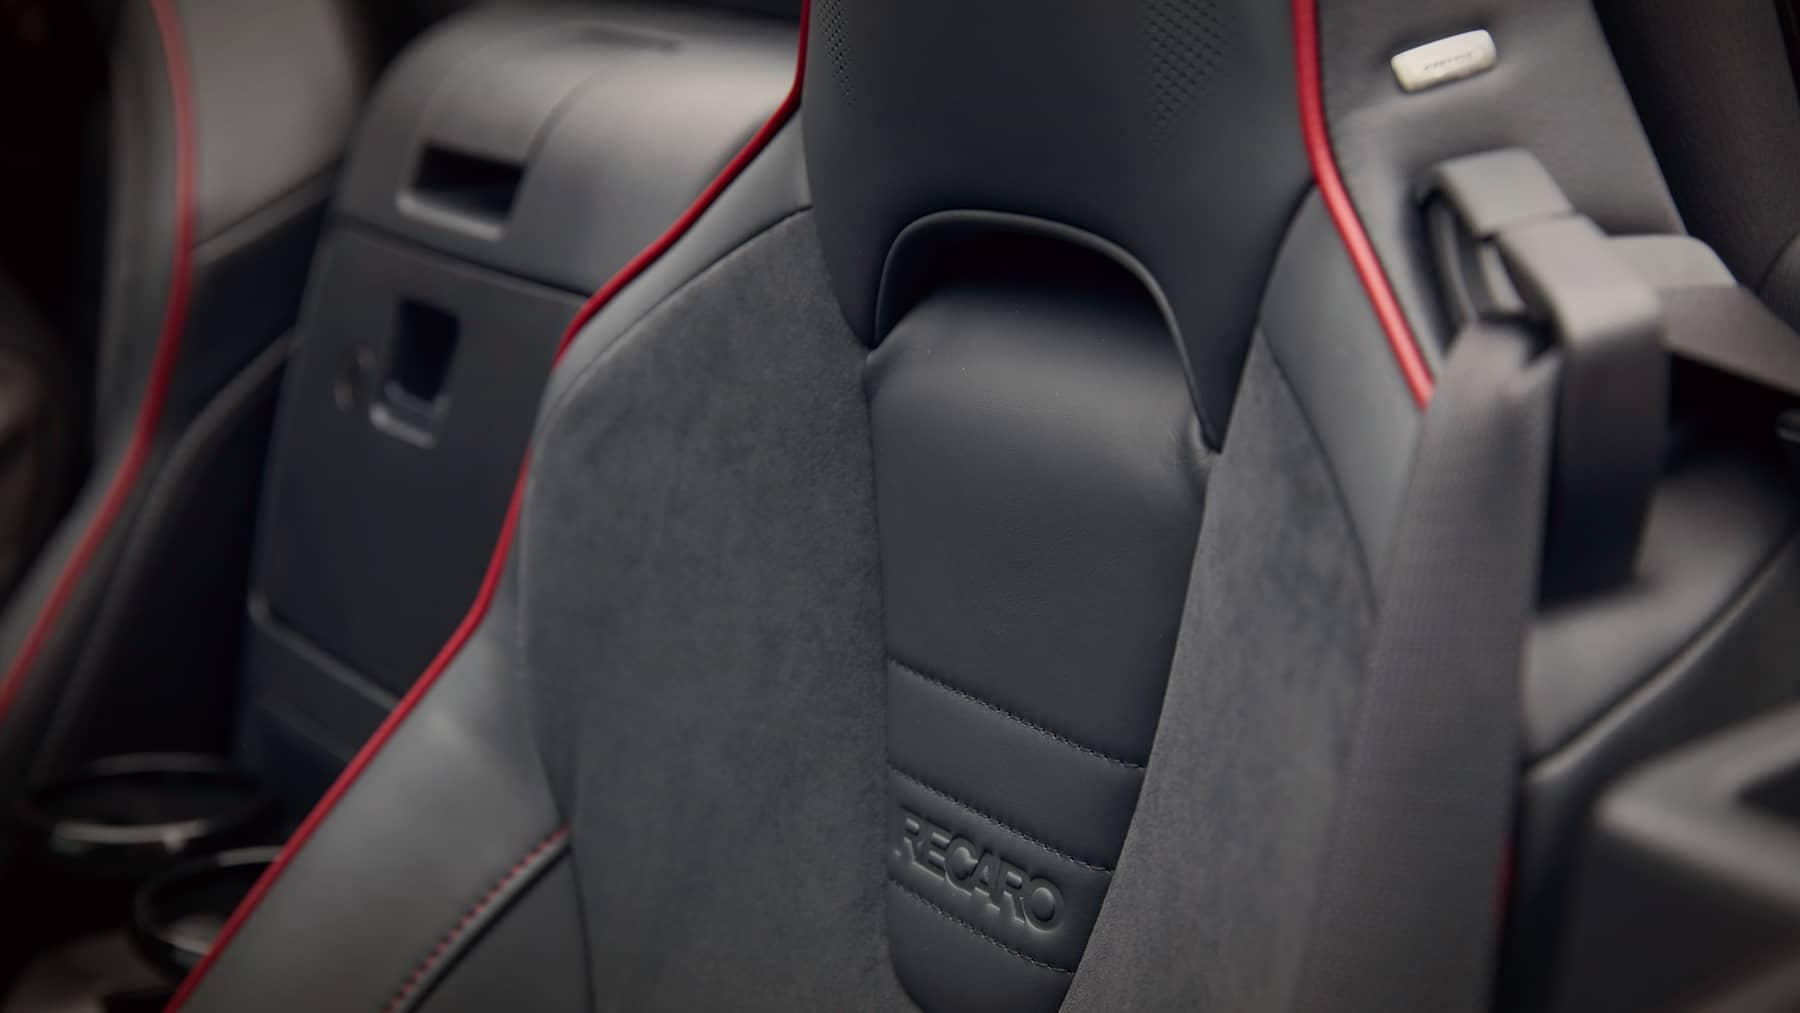 2019 Mazda MX-5 Miata Seat